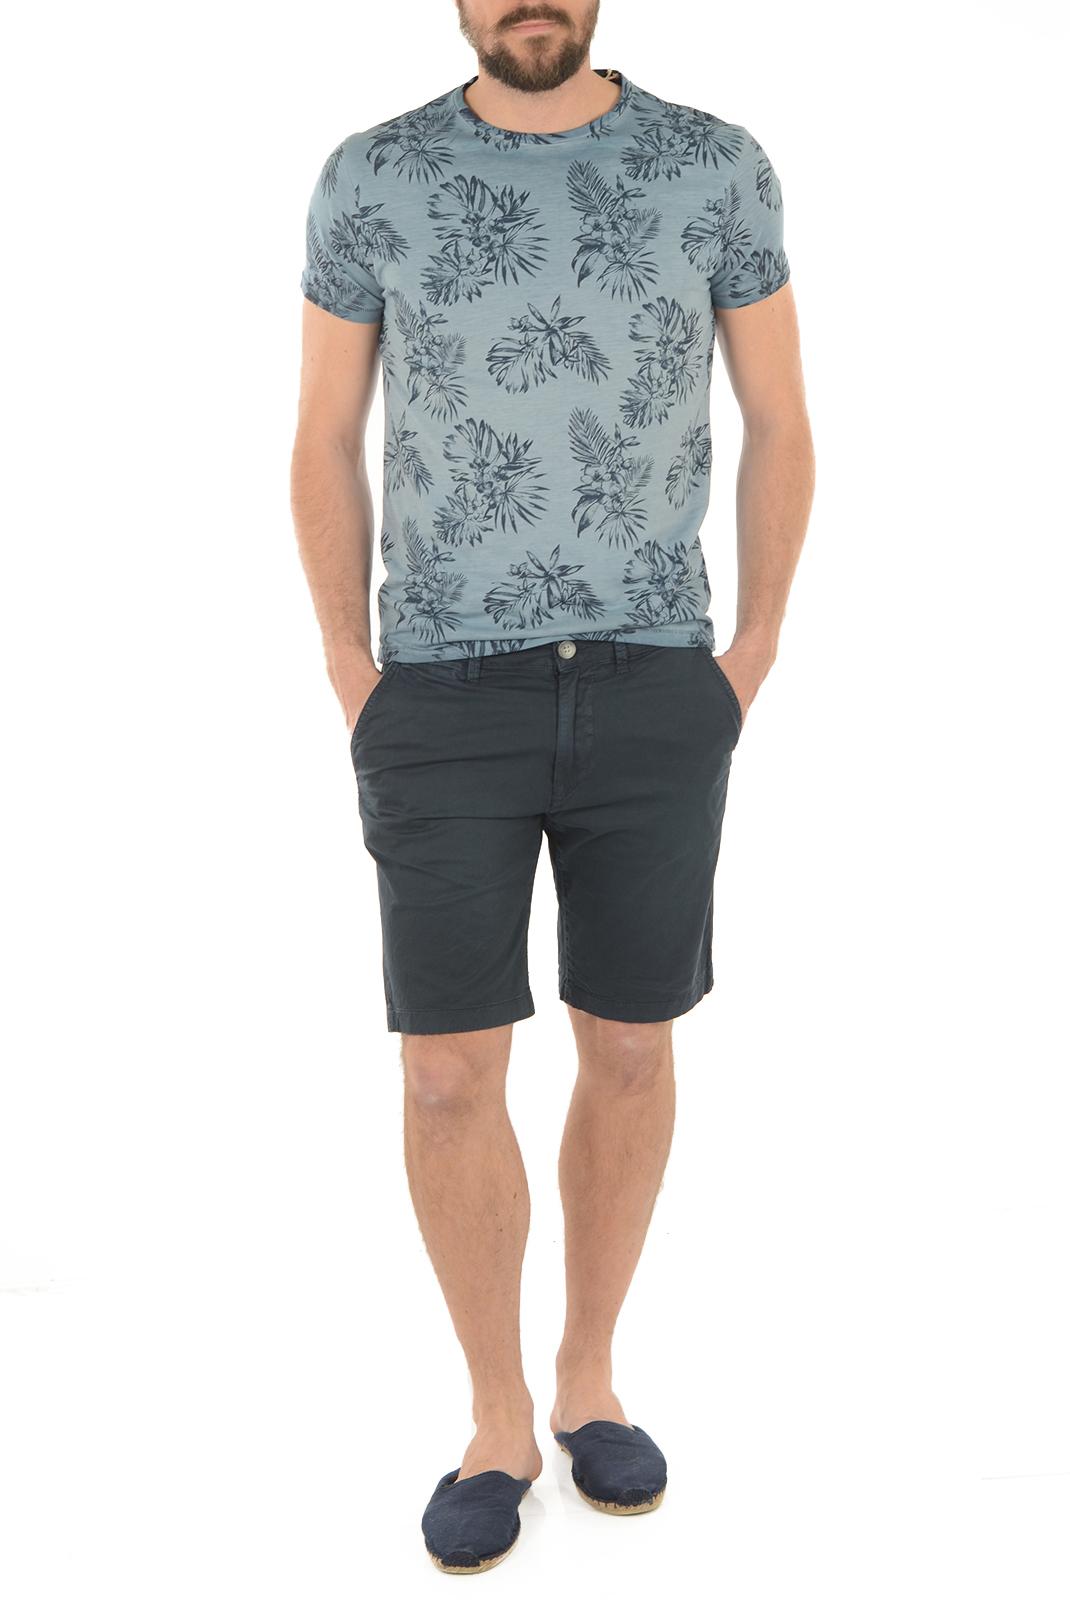 Tee-shirts  Pepe jeans PM503607 BLUTROP 551 BLUE